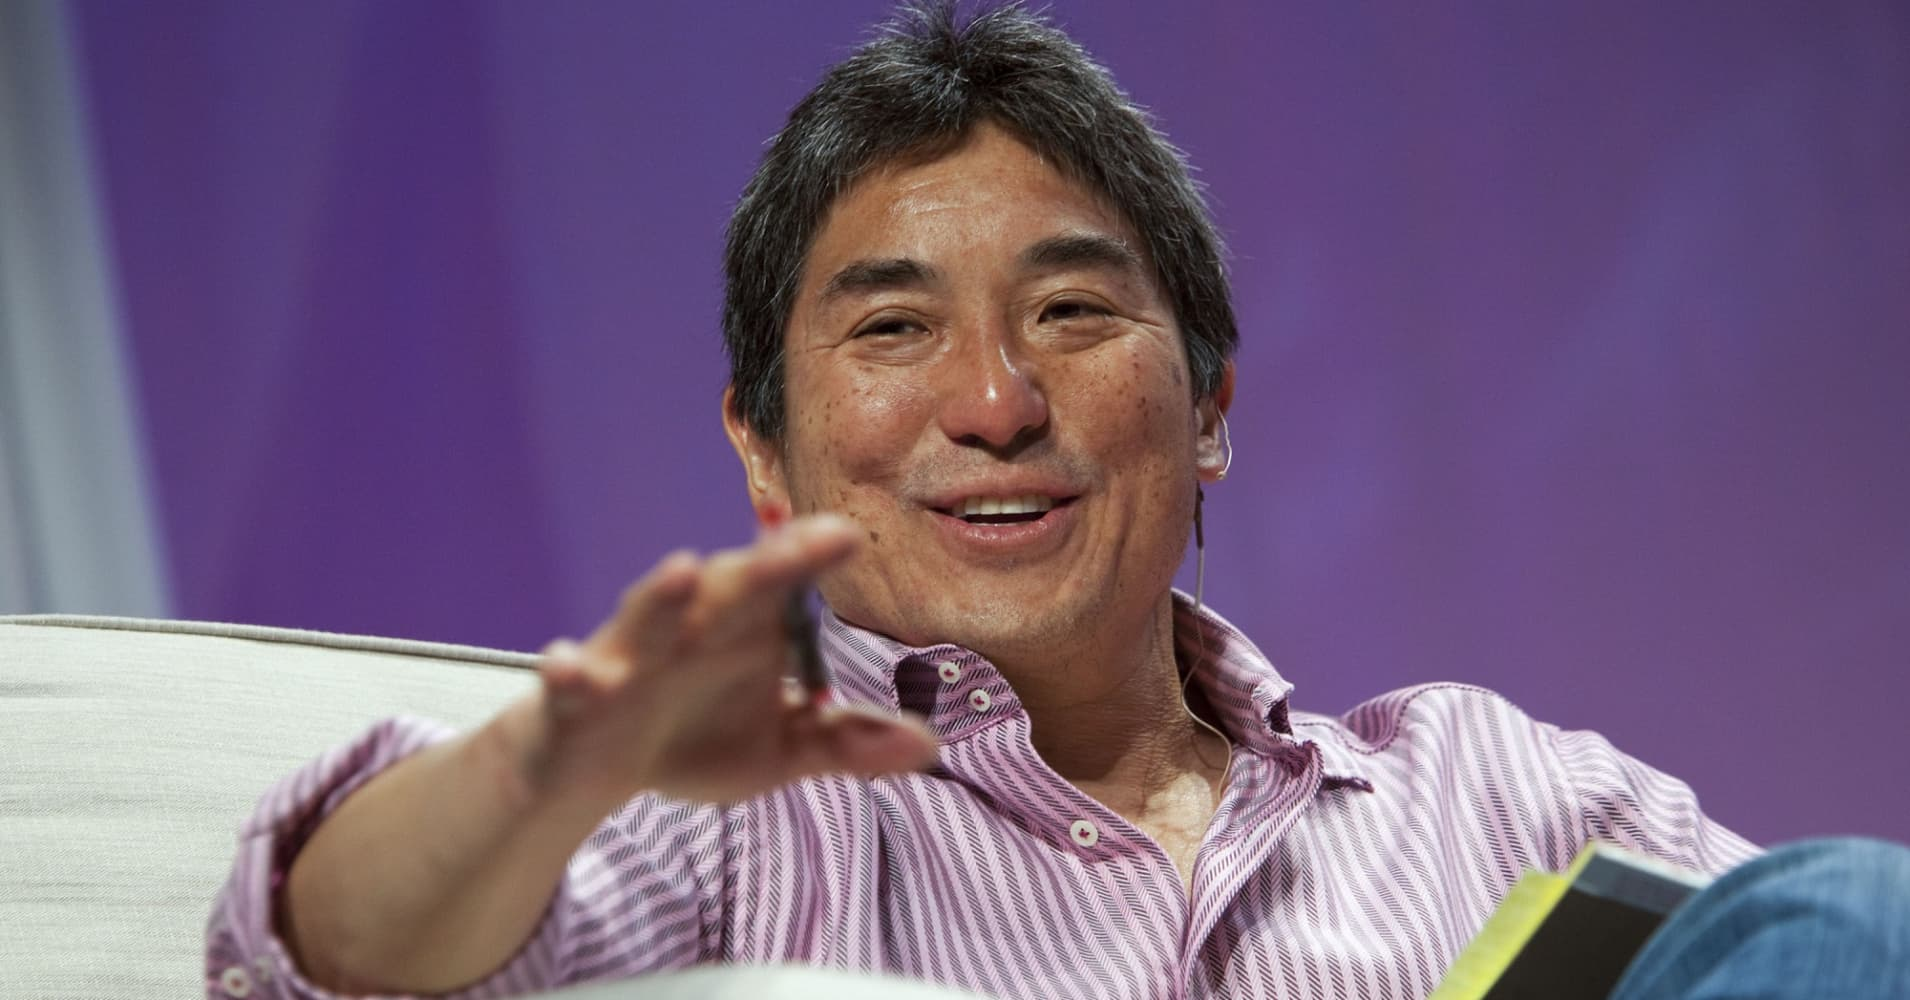 Guy Kawasaki speaks at the Macworld 2010 conference.